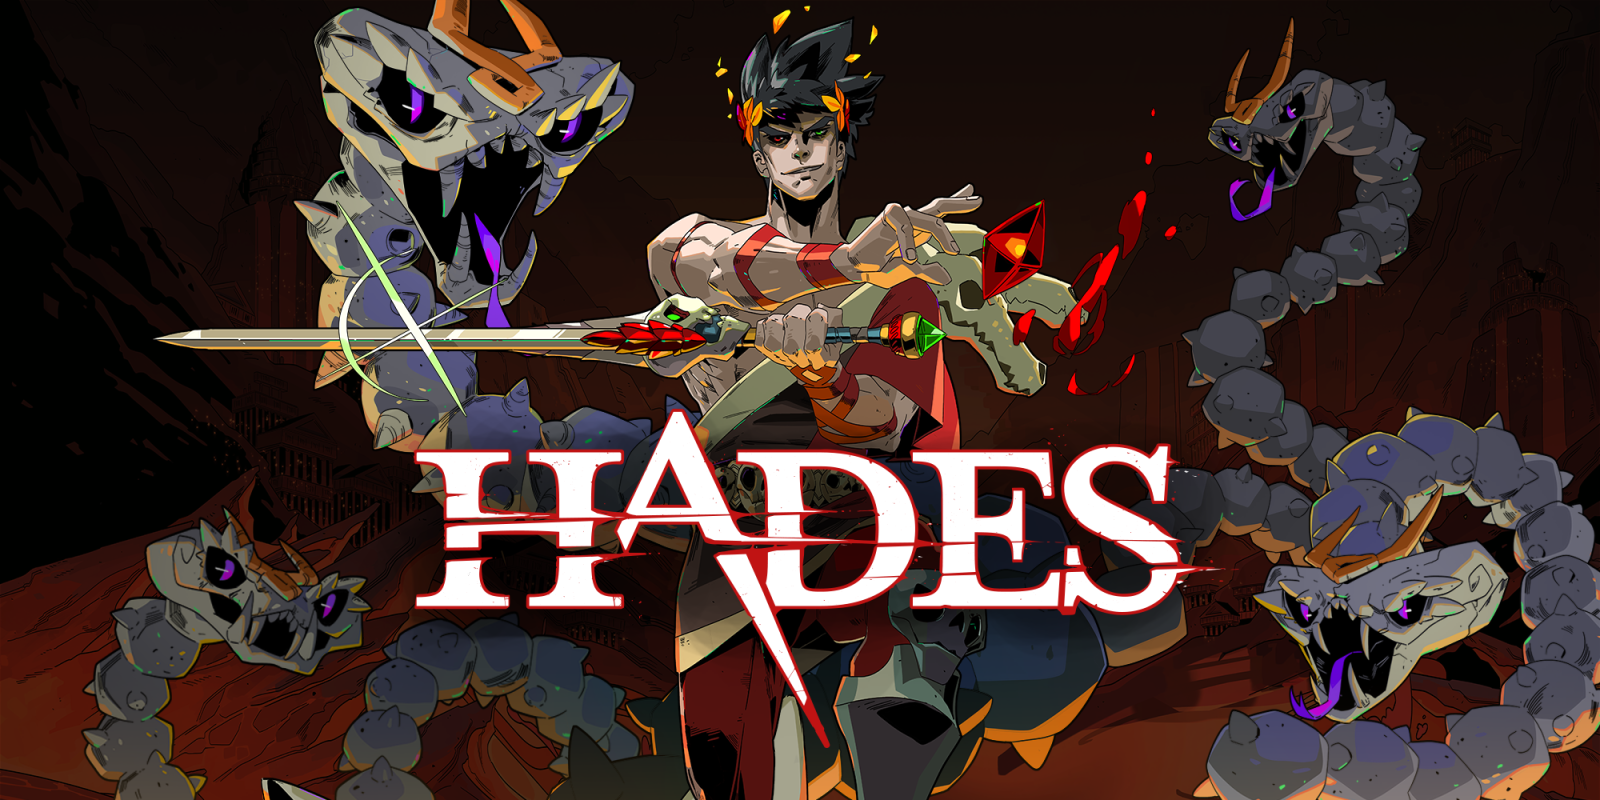 hadès 2